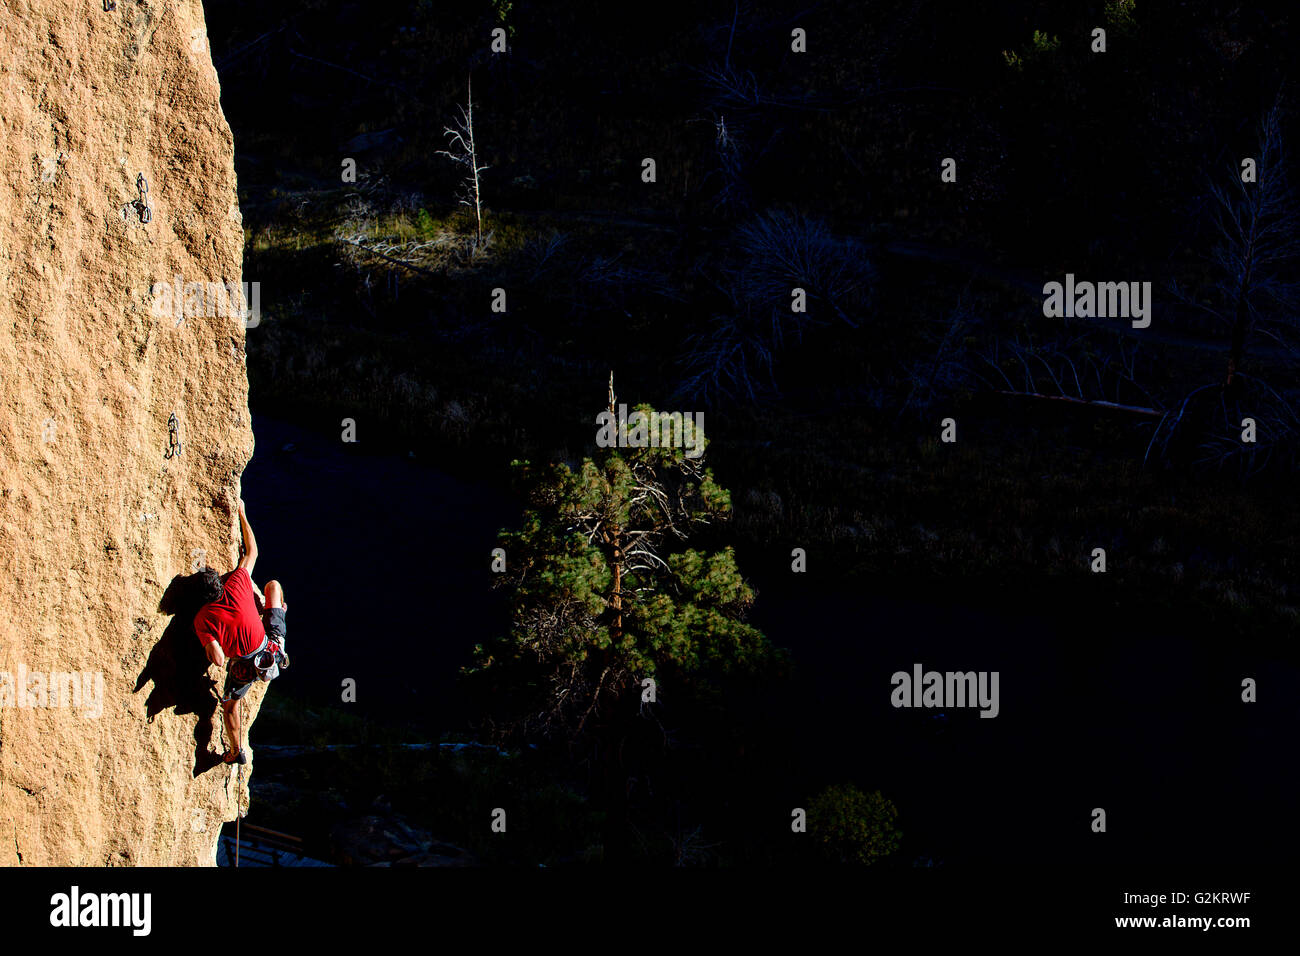 Klettern, British Columbia, Kanada Stockbild